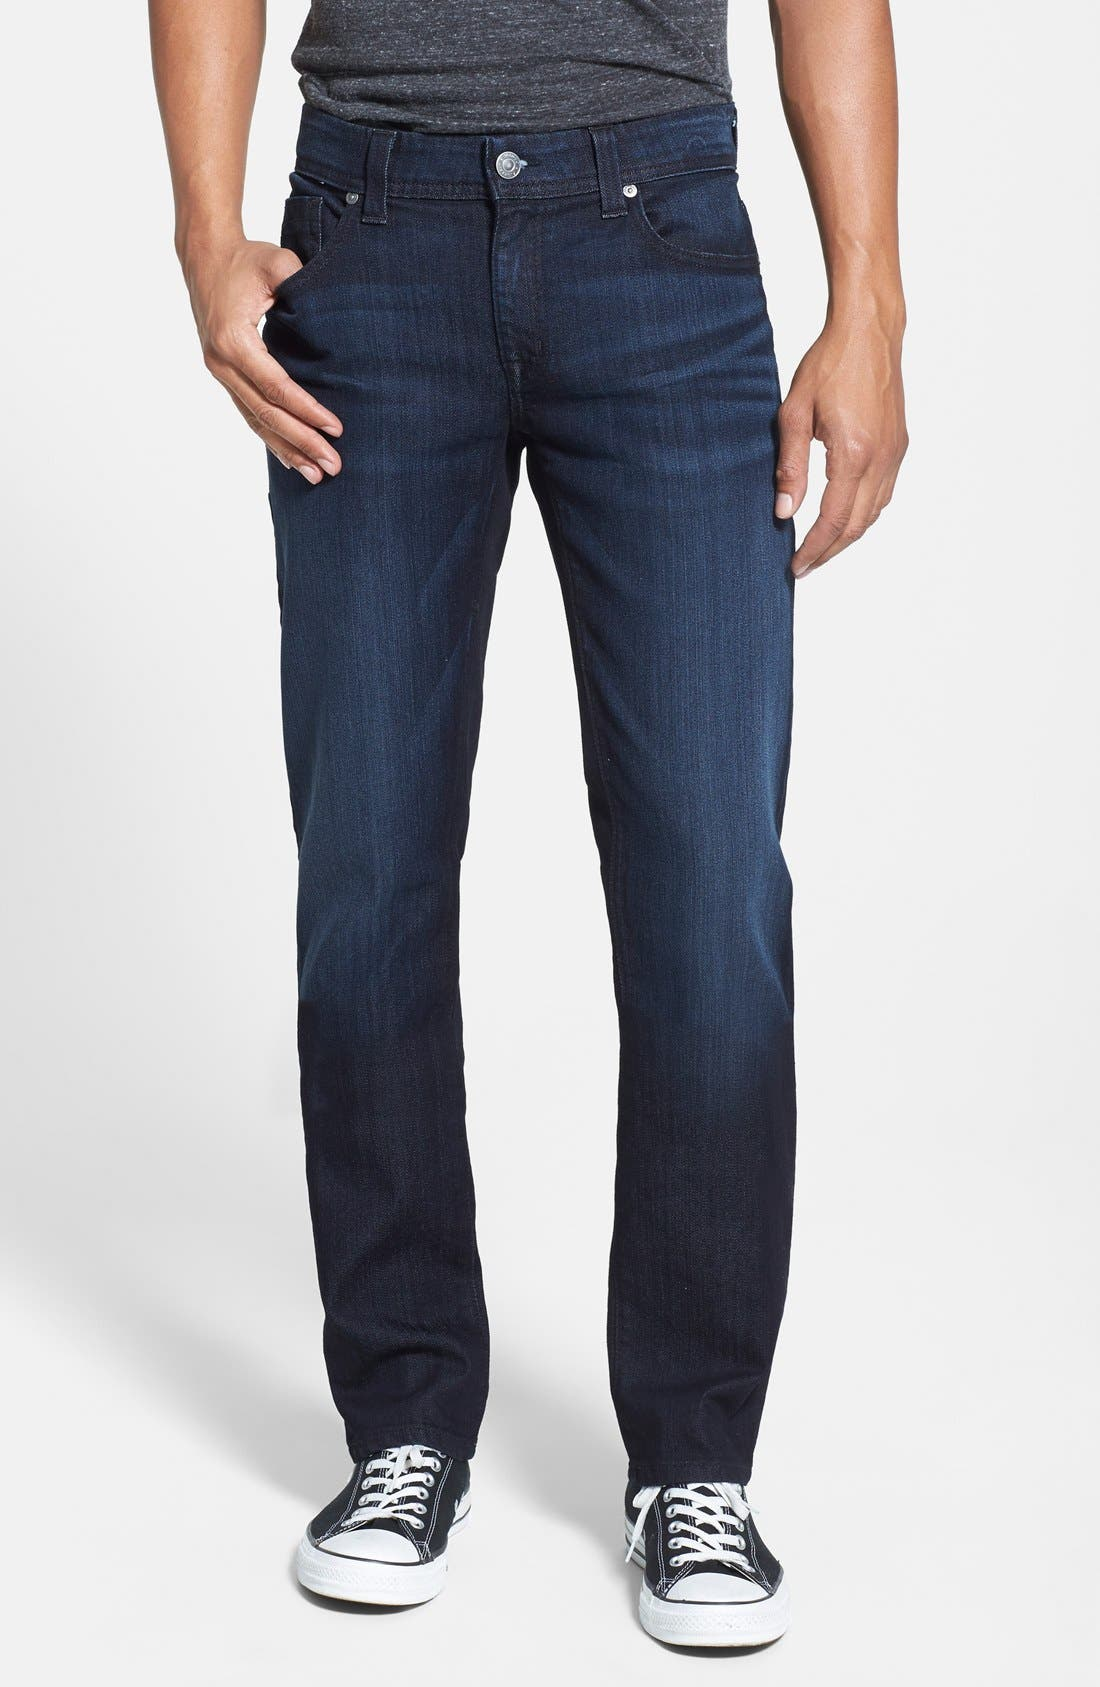 Main Image - Fidelity Denim 'Jimmy' Slim Straight Leg Jeans (Blue/Black)